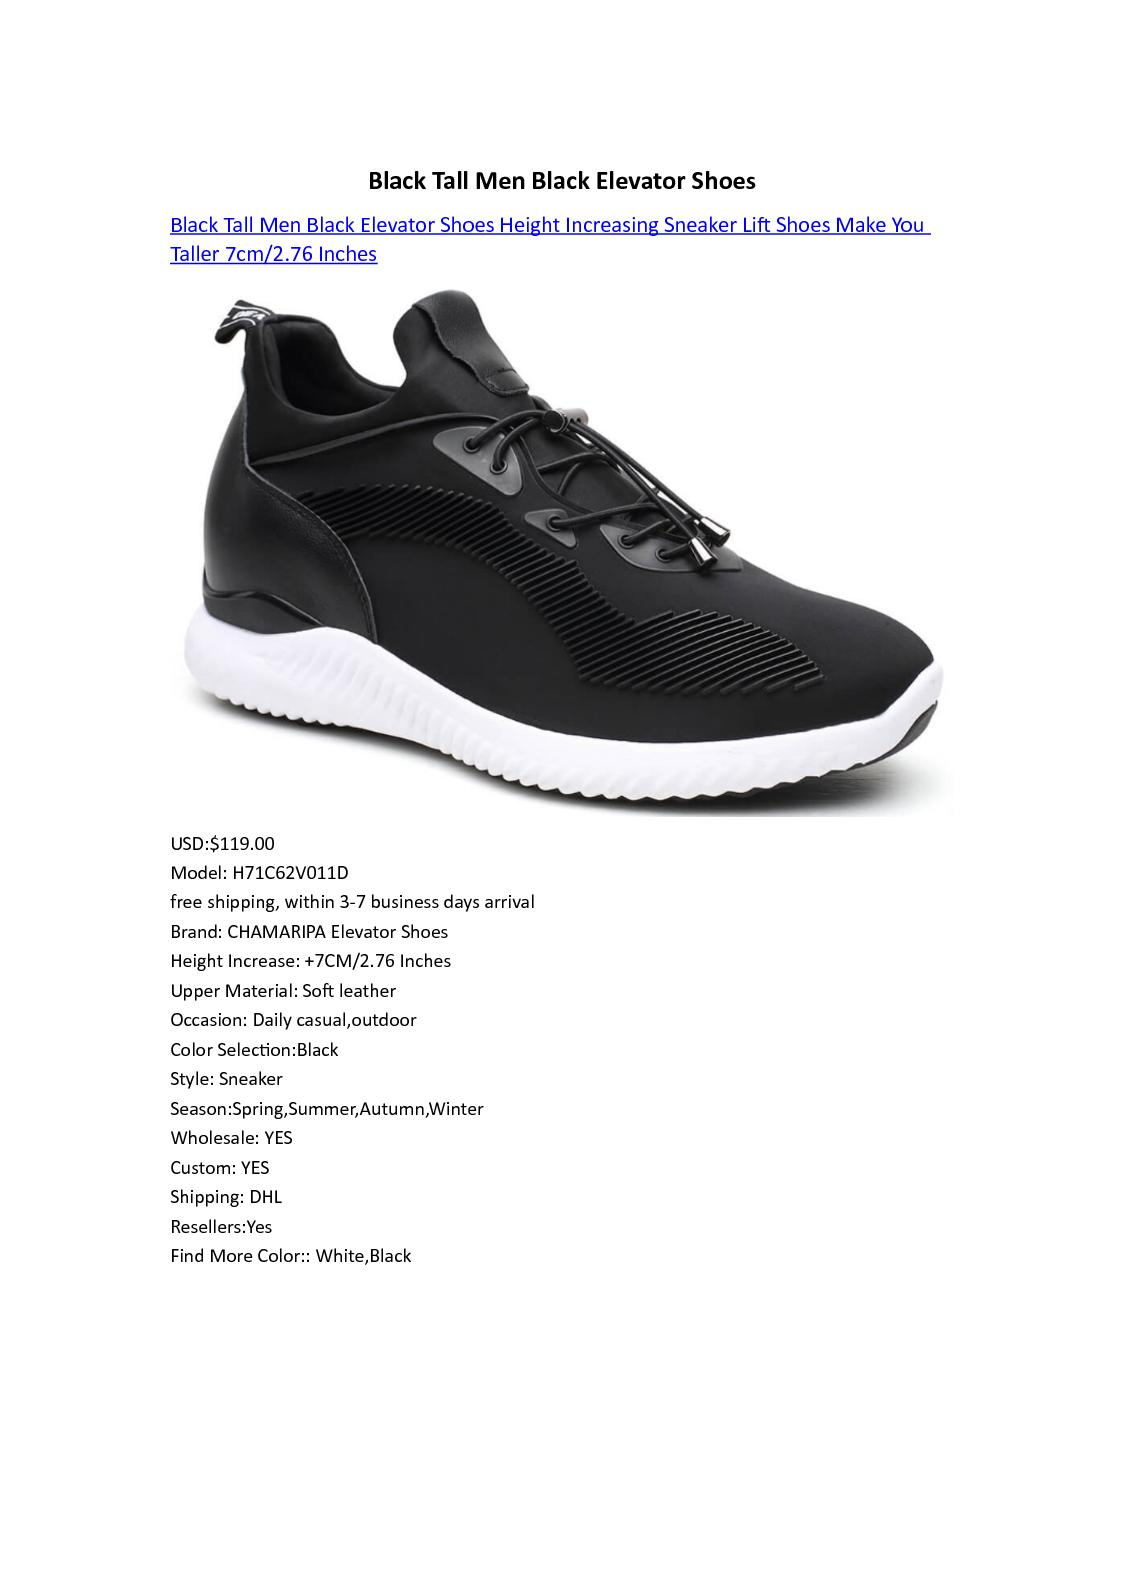 Black Tall Men Black Elevator Shoes